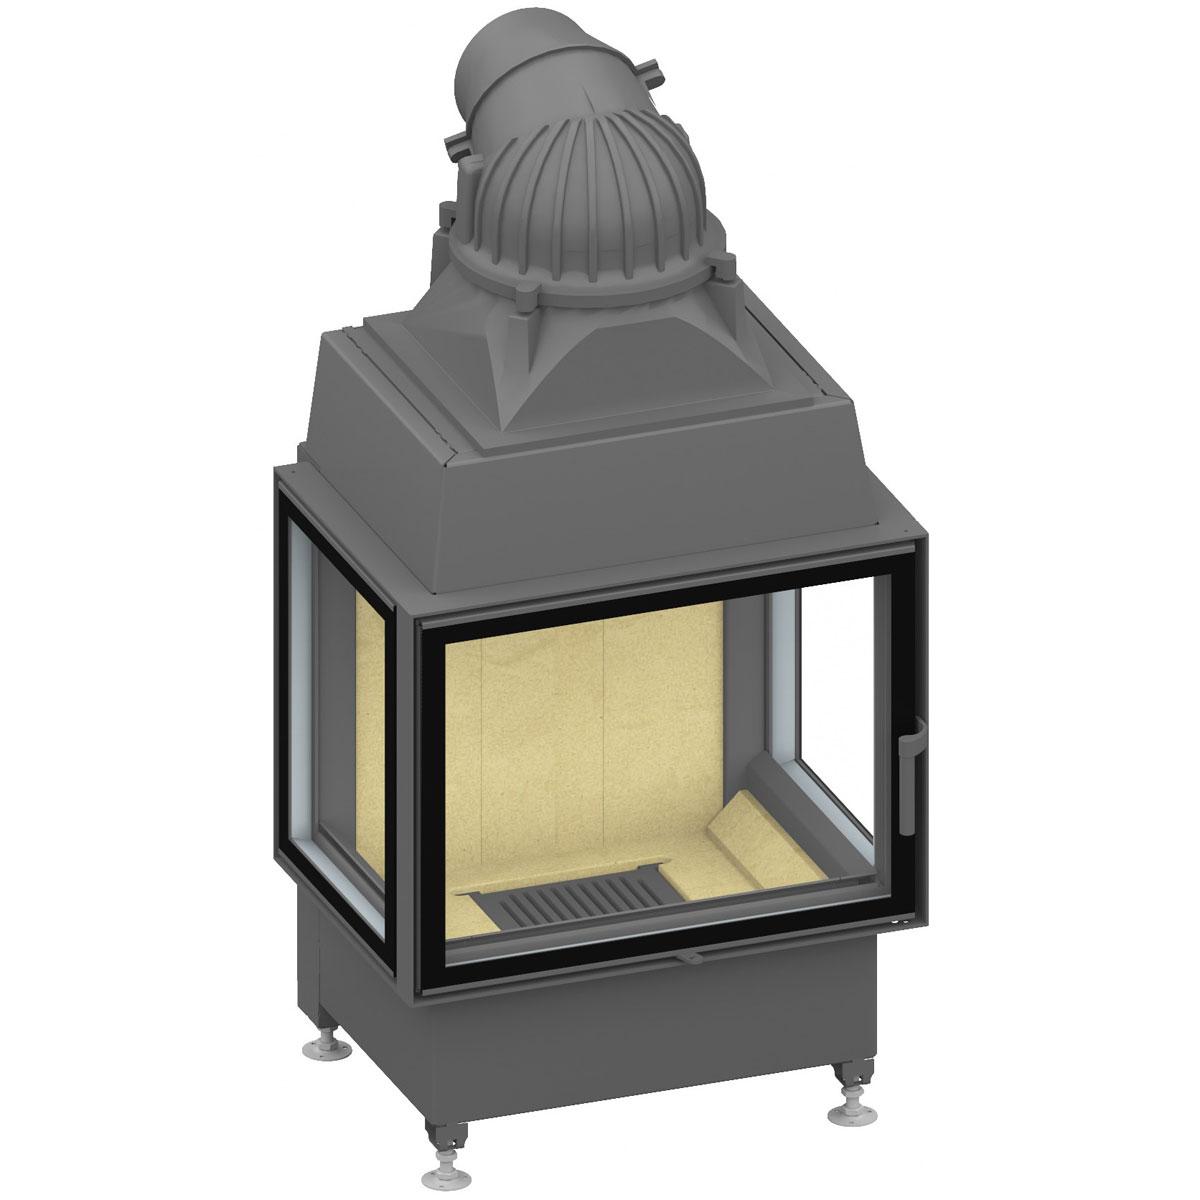 kamineinsatz schmid ekko u 6745s. Black Bedroom Furniture Sets. Home Design Ideas